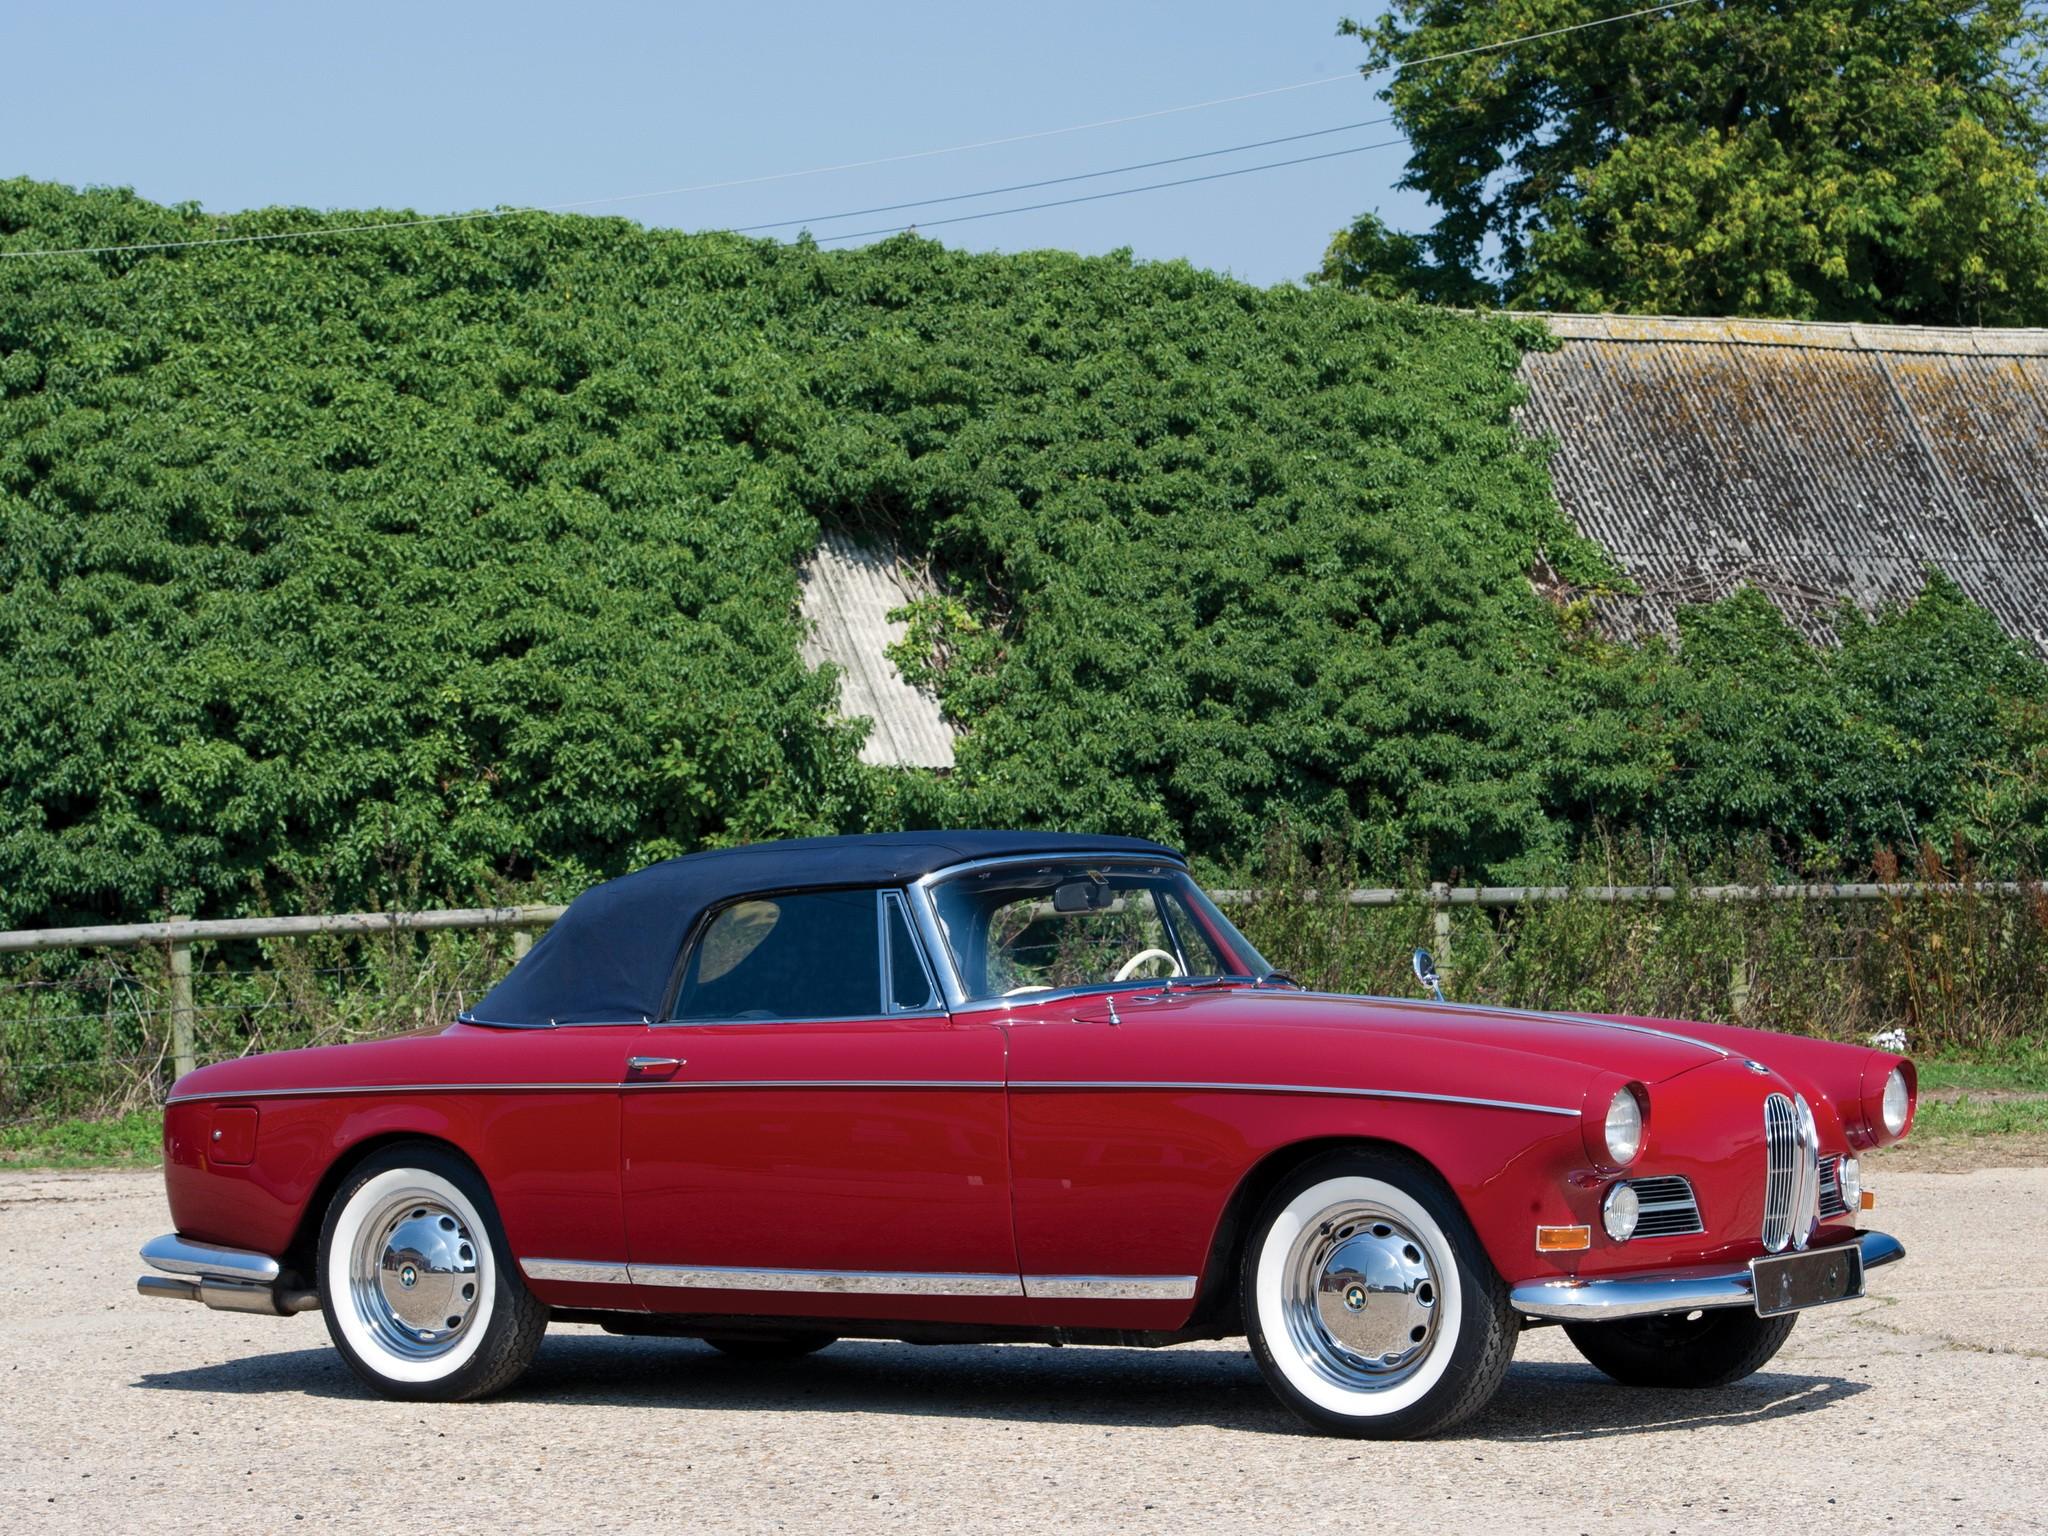 BMW 503 Cabriolet specs - 1956, 1957, 1958, 1959 - autoevolution